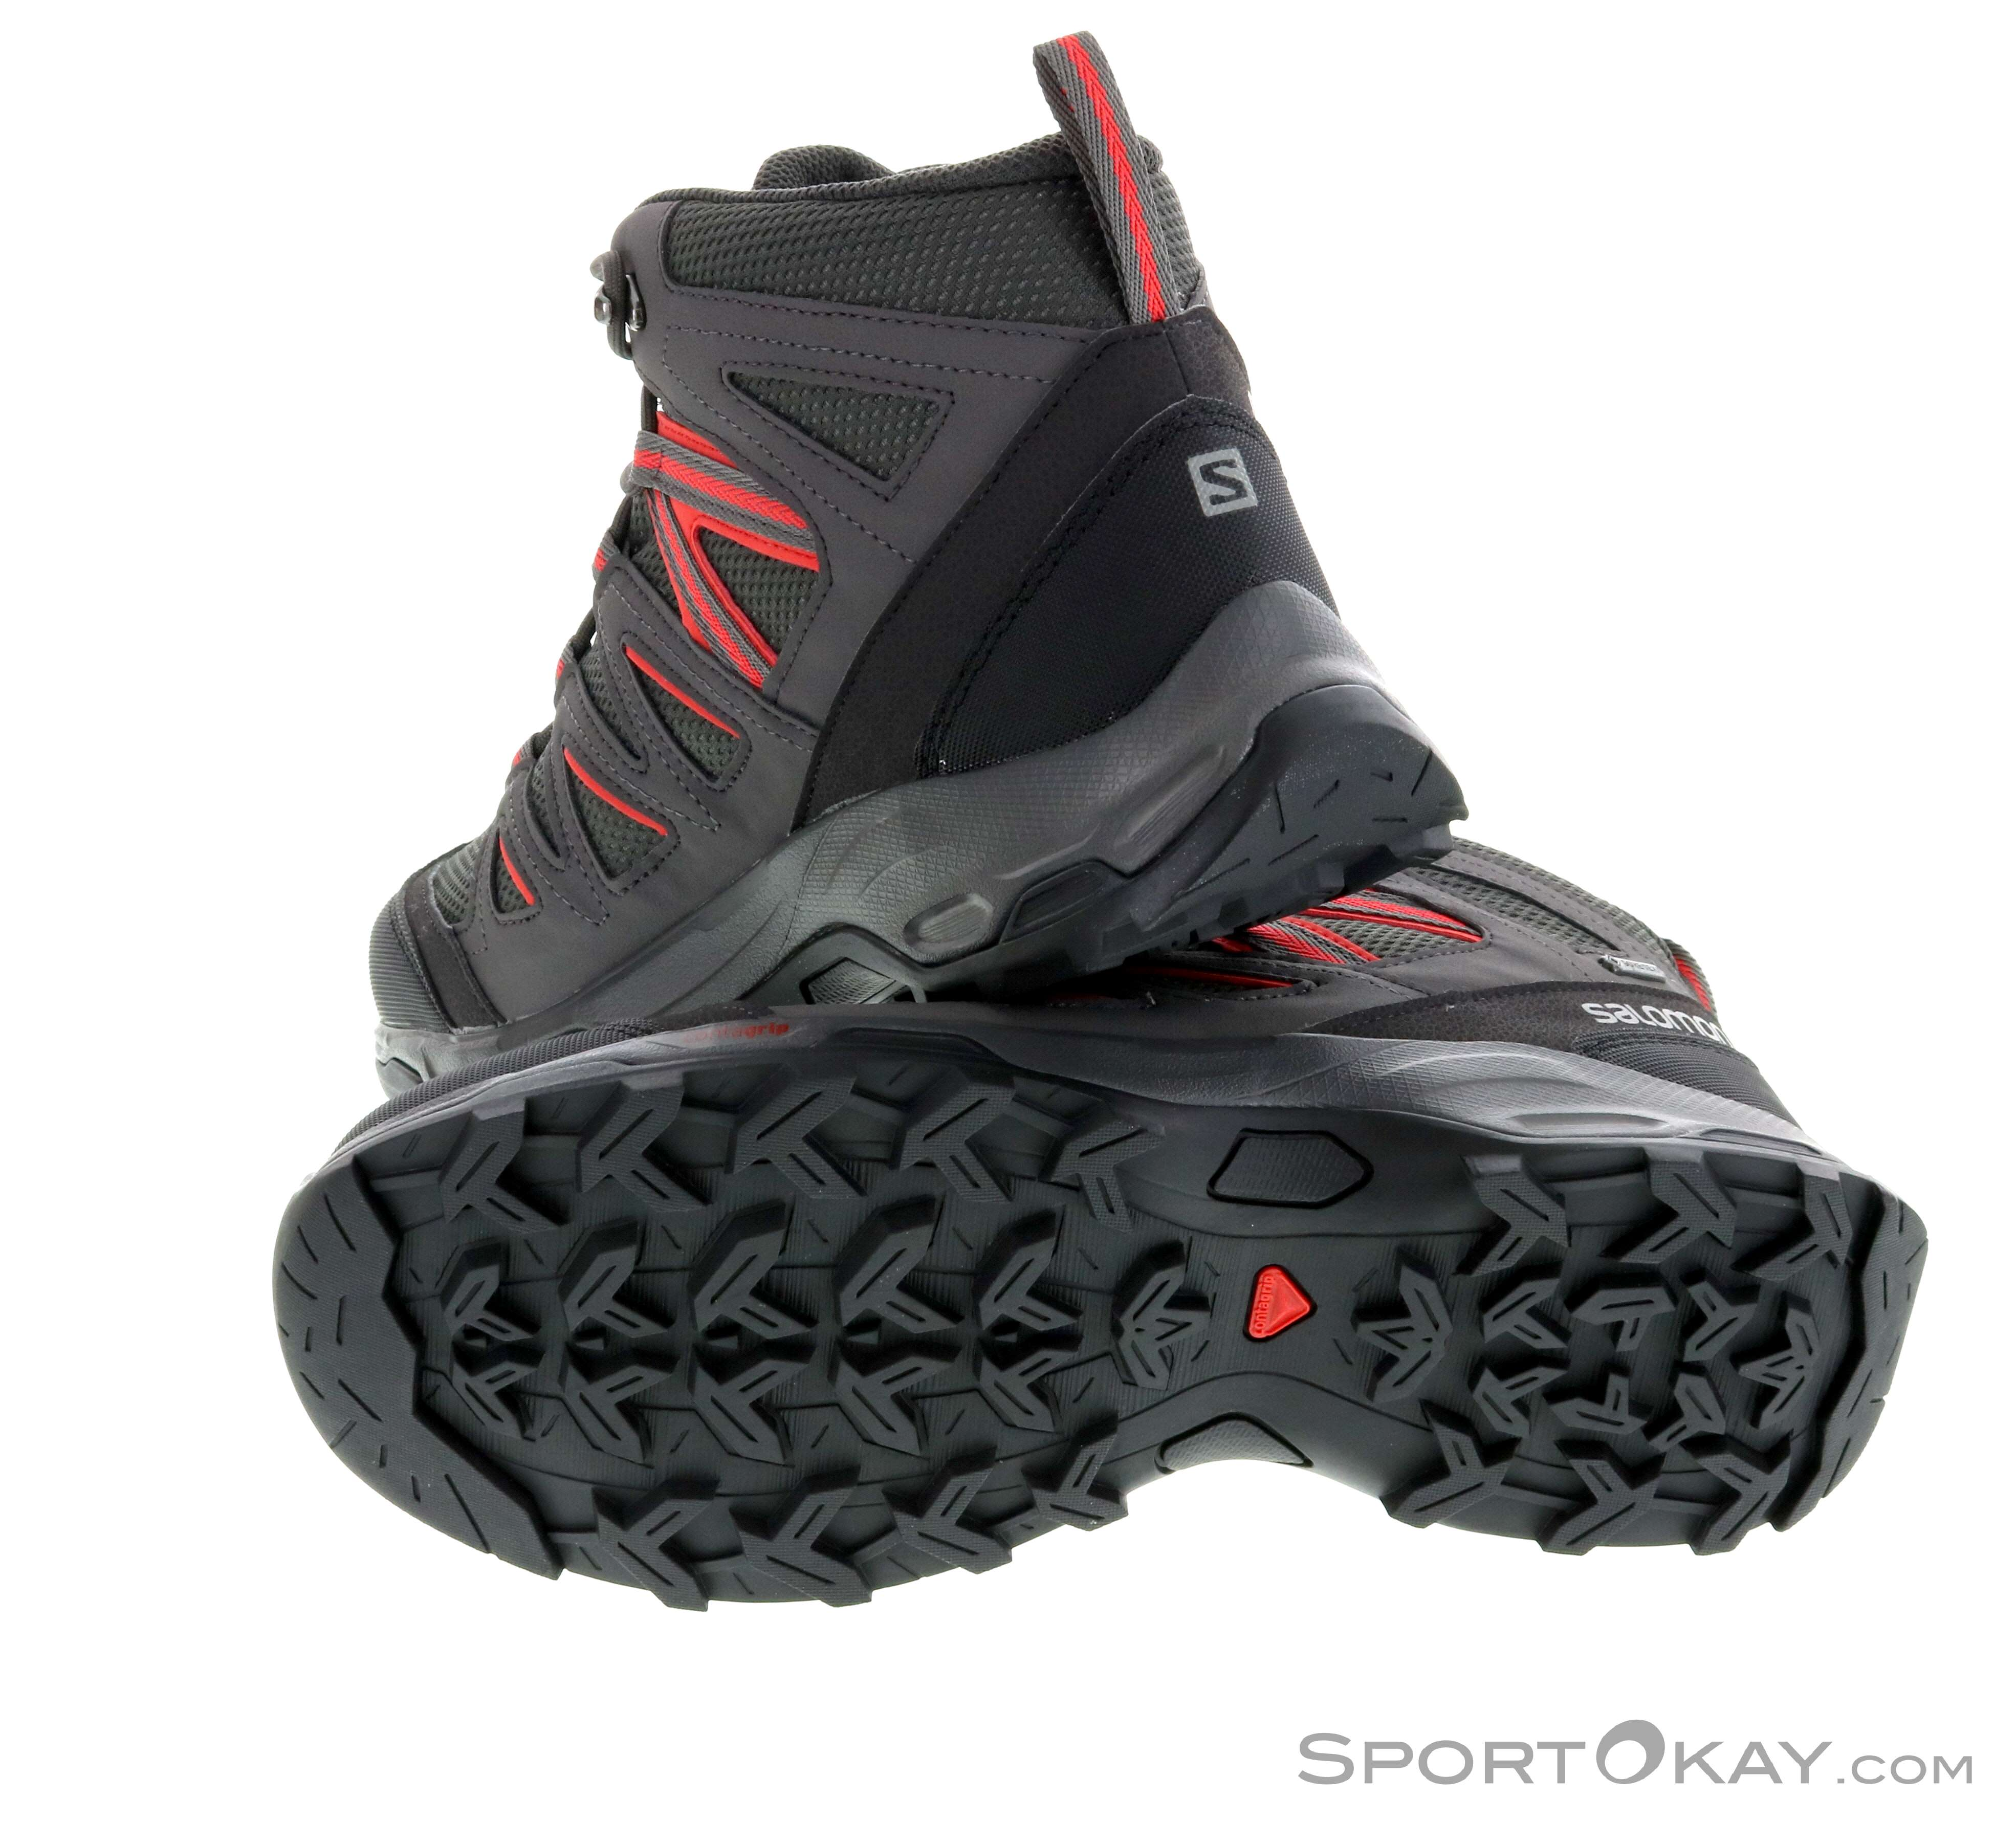 SALOMON HILLROCK MID GTX Gore Tex Trekking Wander Schuhe